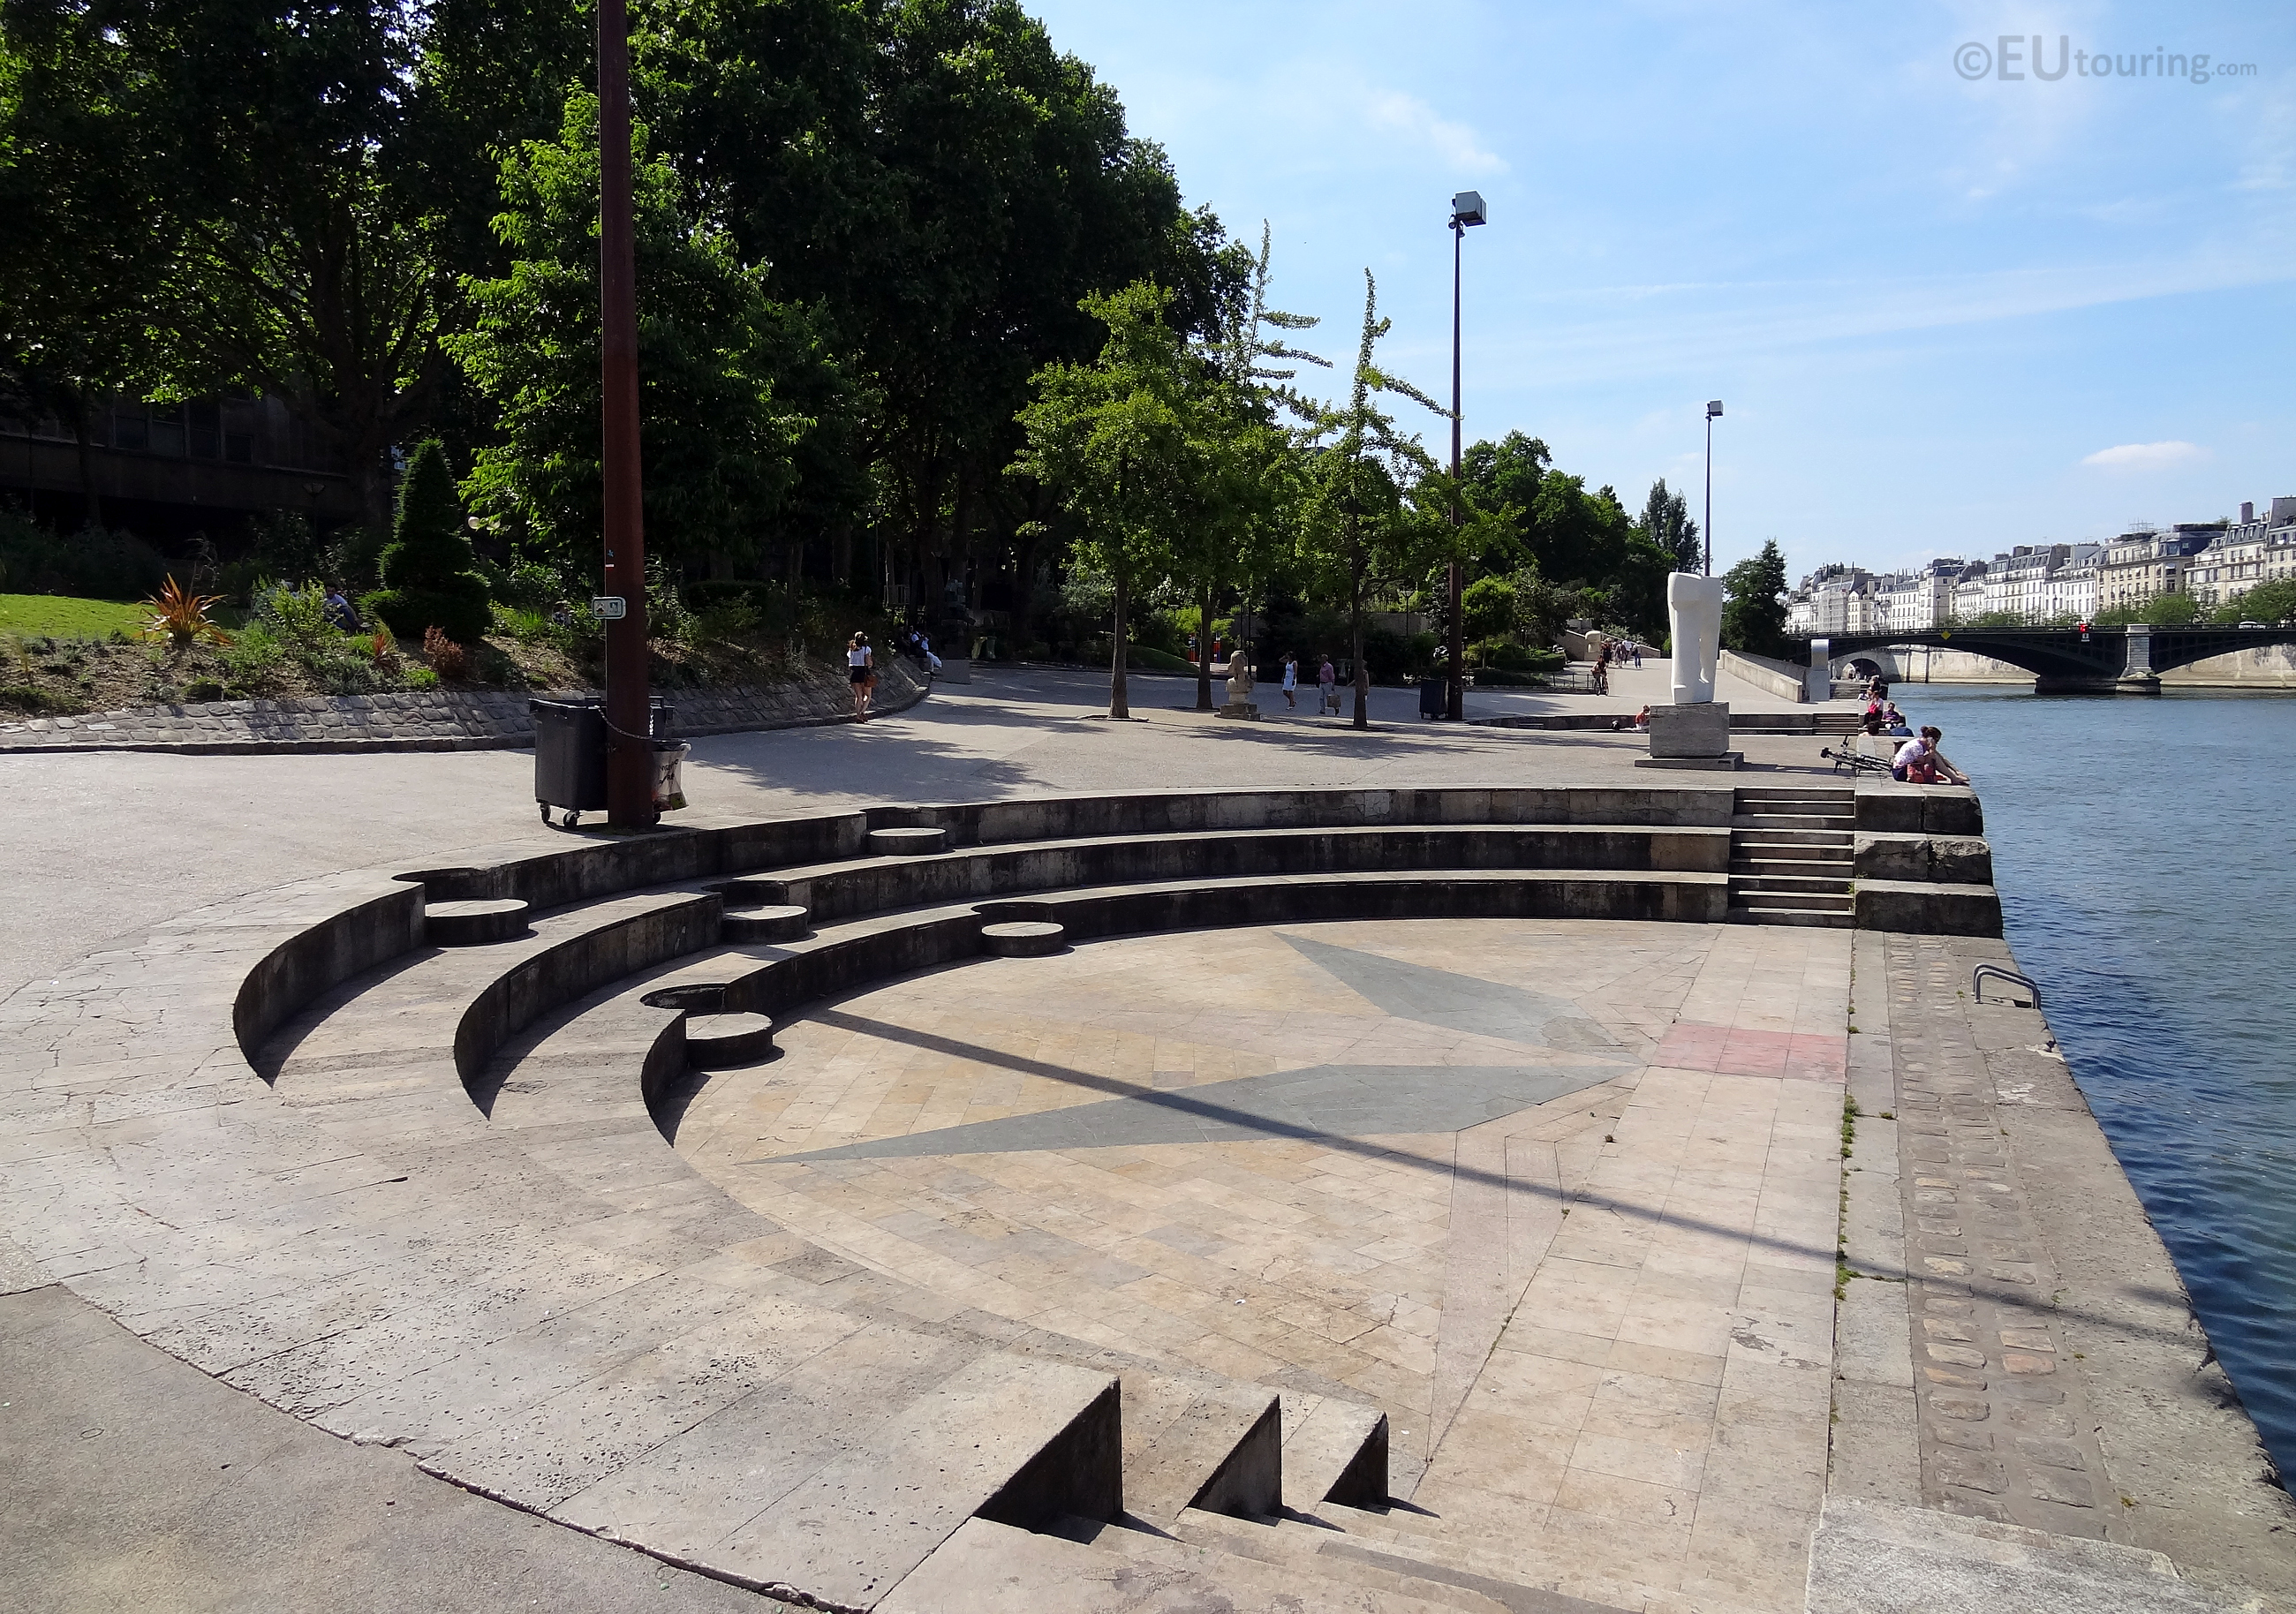 Amphitheatre at Jardin Tino Rossi